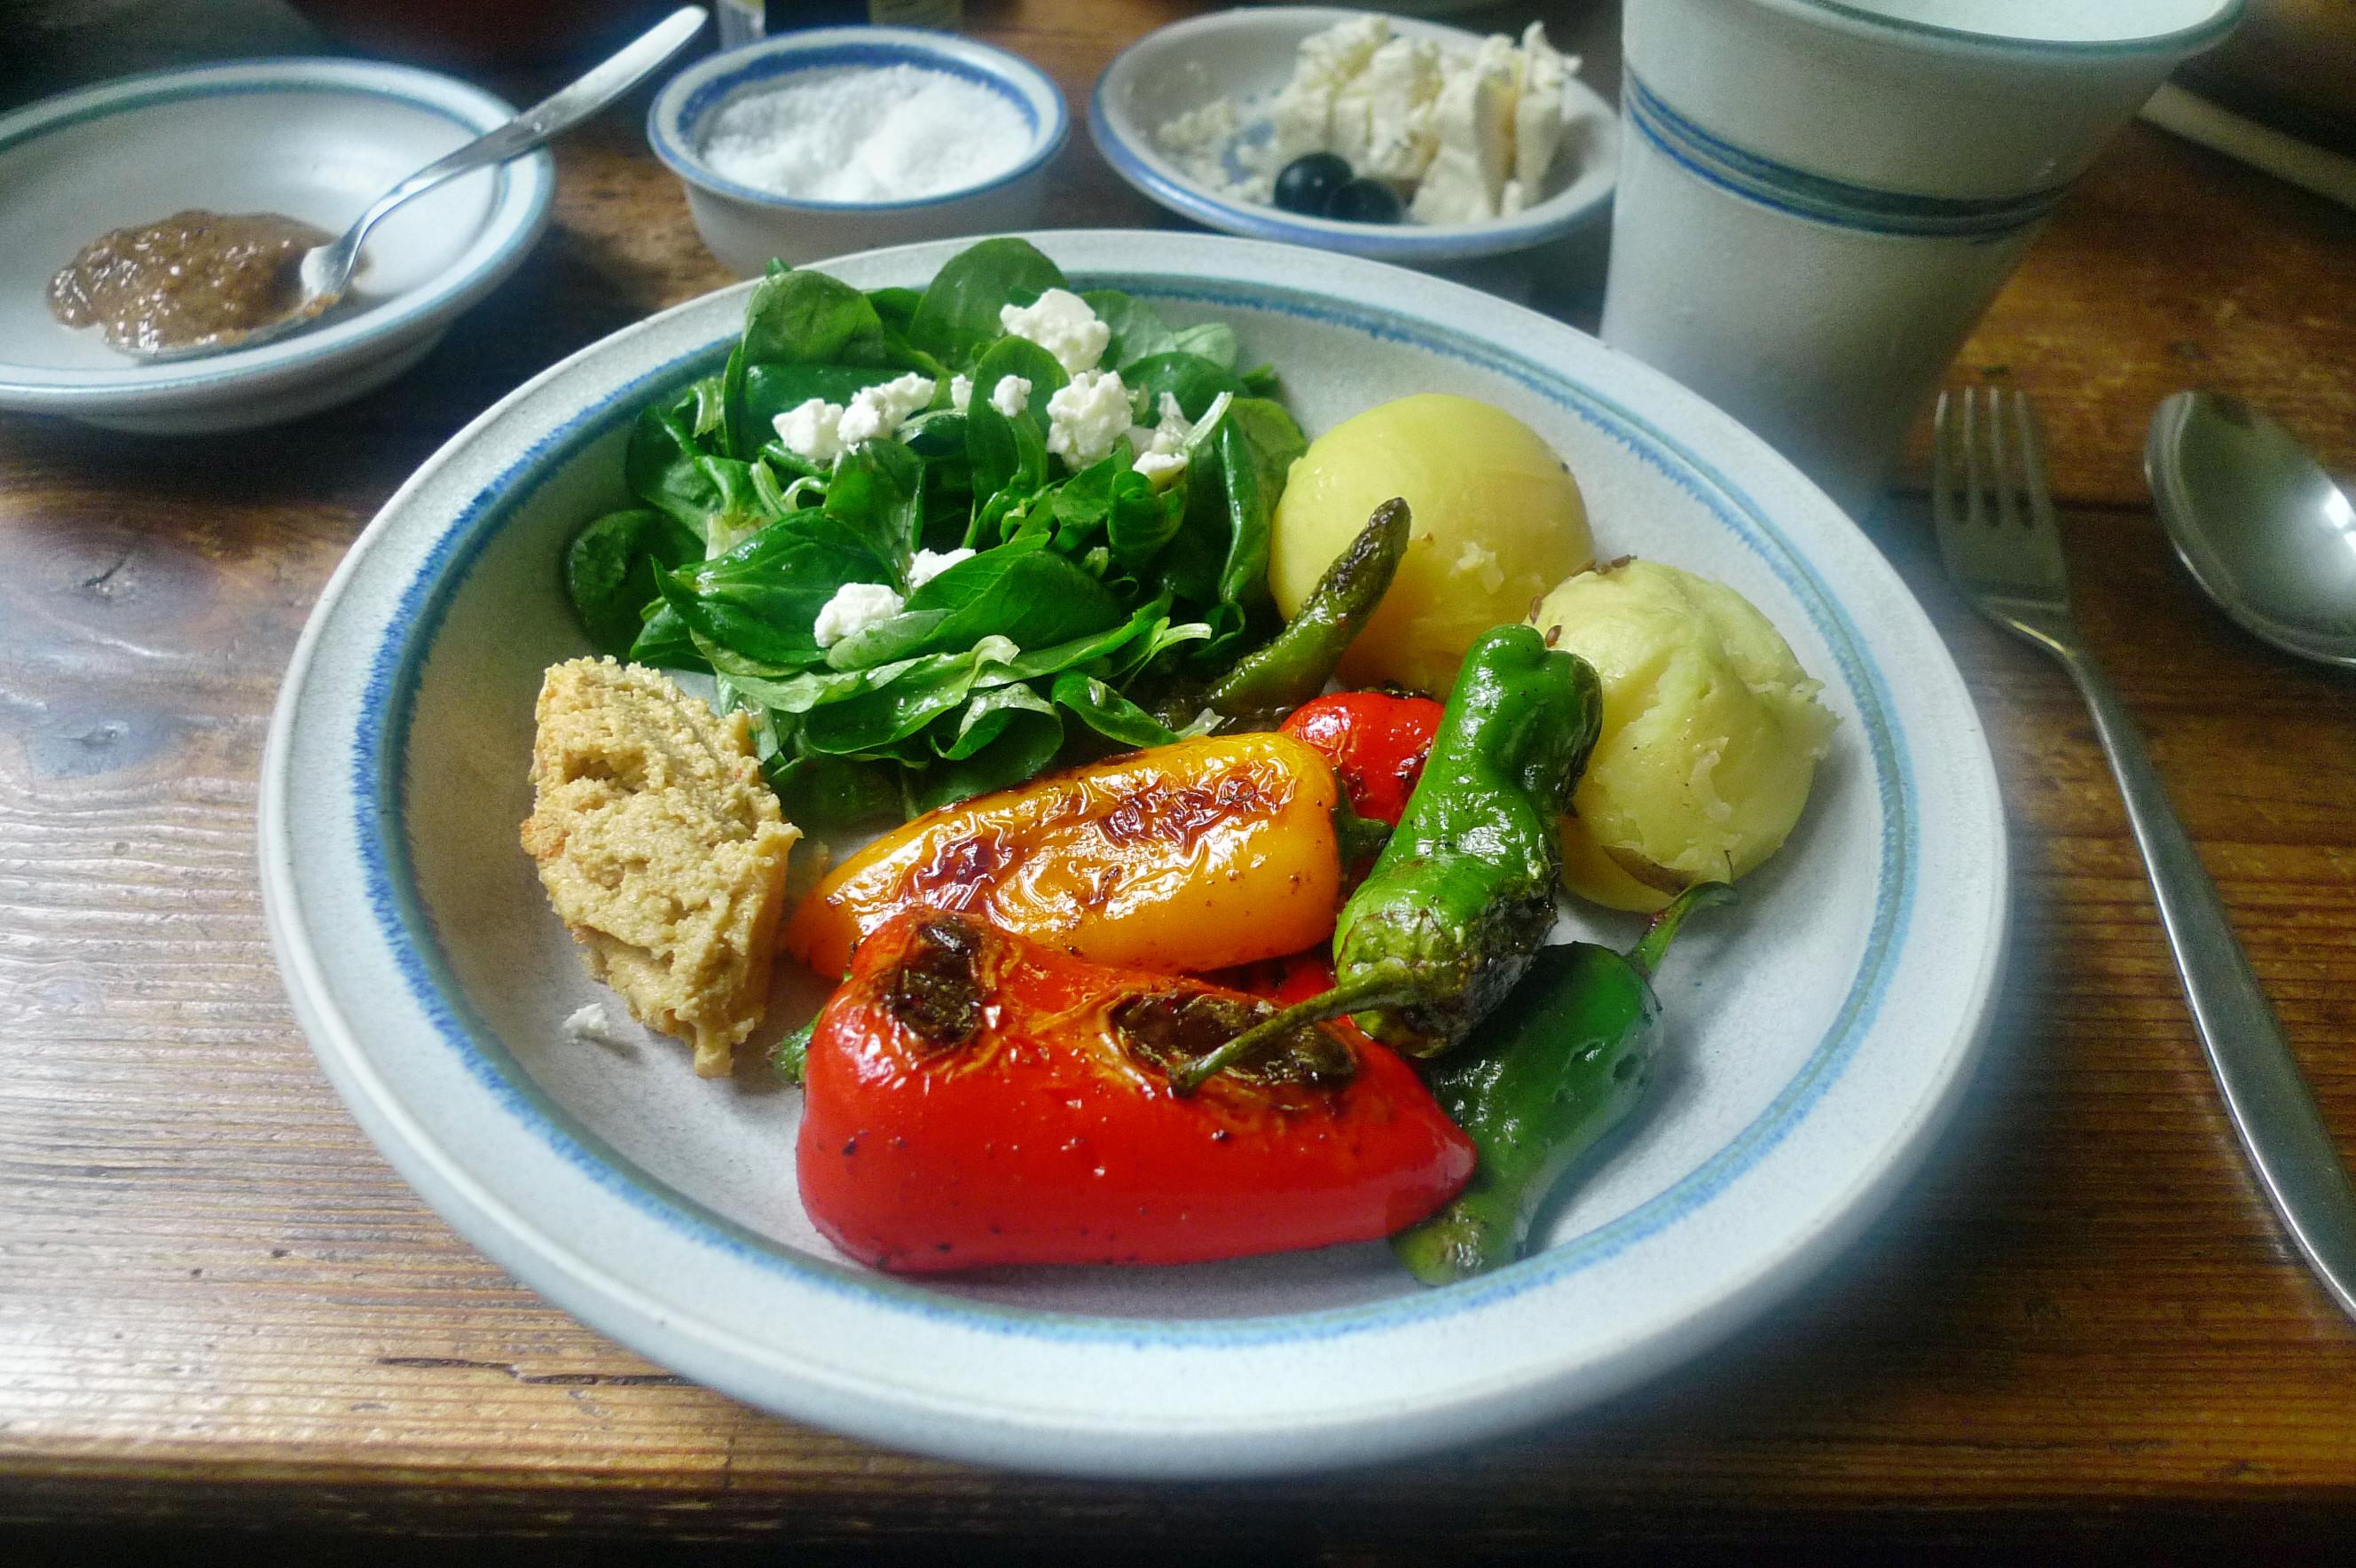 Pimentos-Paprika-Kartoffel-Salat-Buttermilch- 28.9.14   (12)